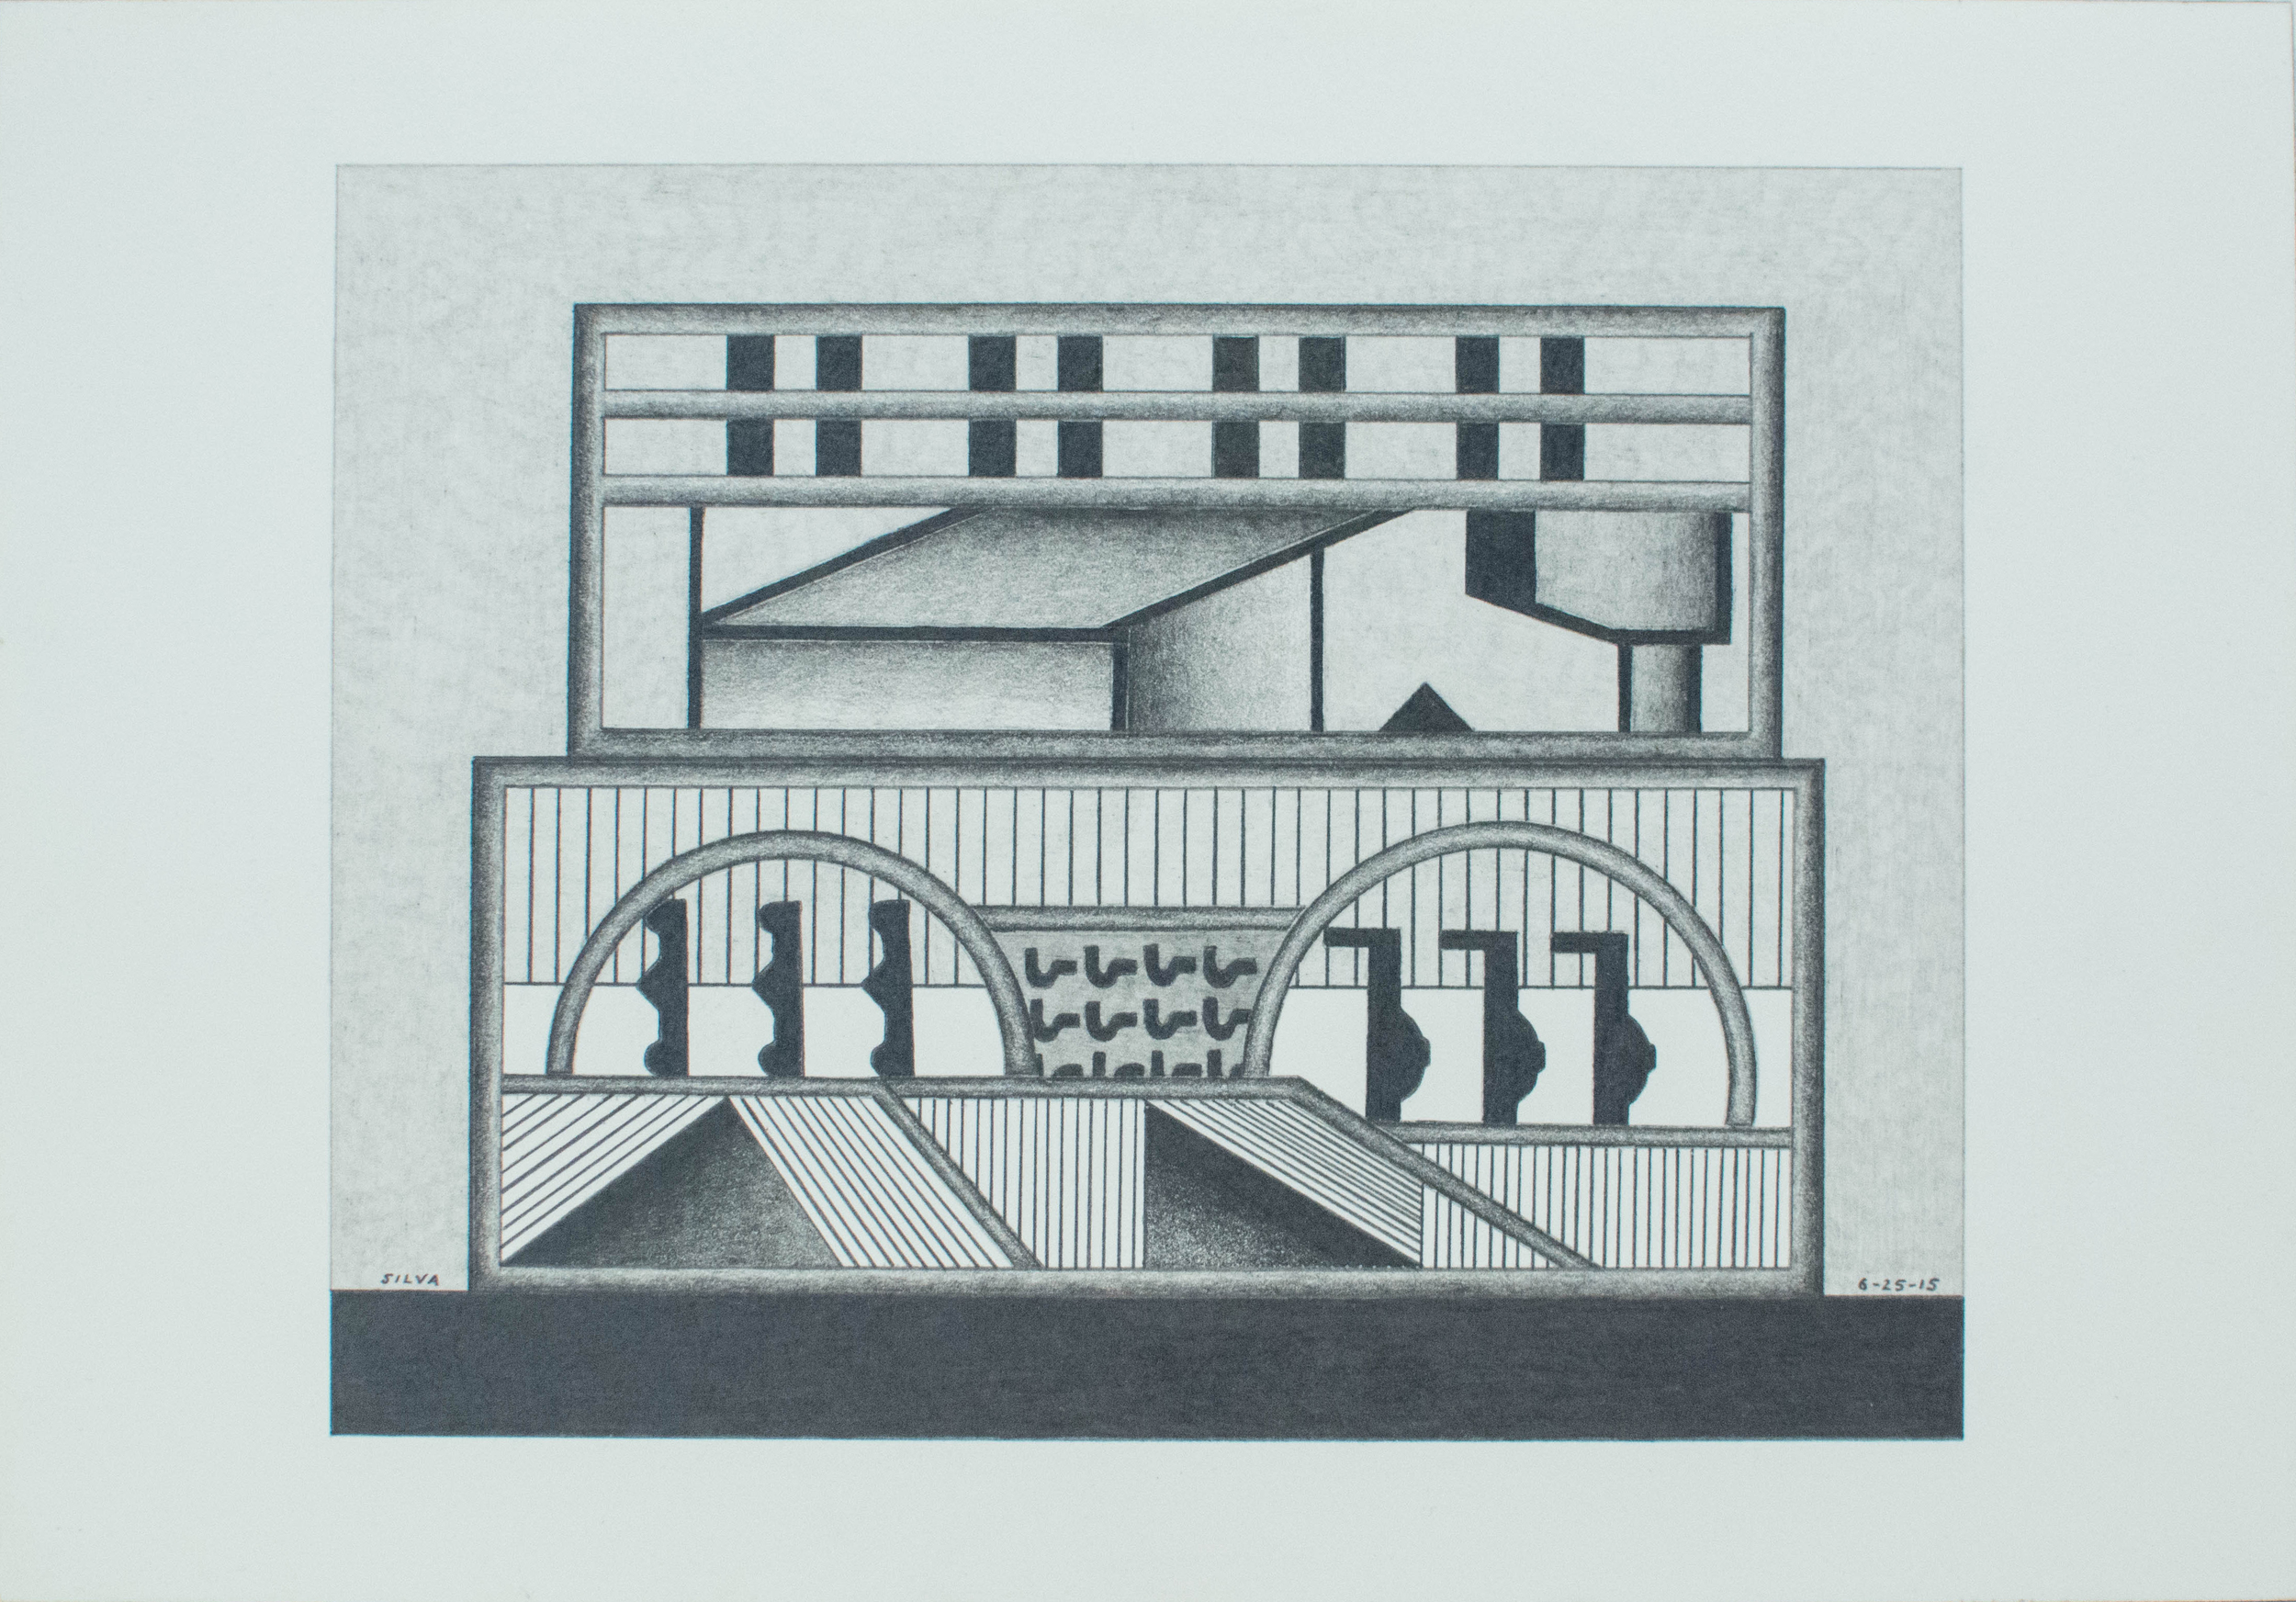 6-25-15, 2015, Graphite on paper, 7 x 10 inches